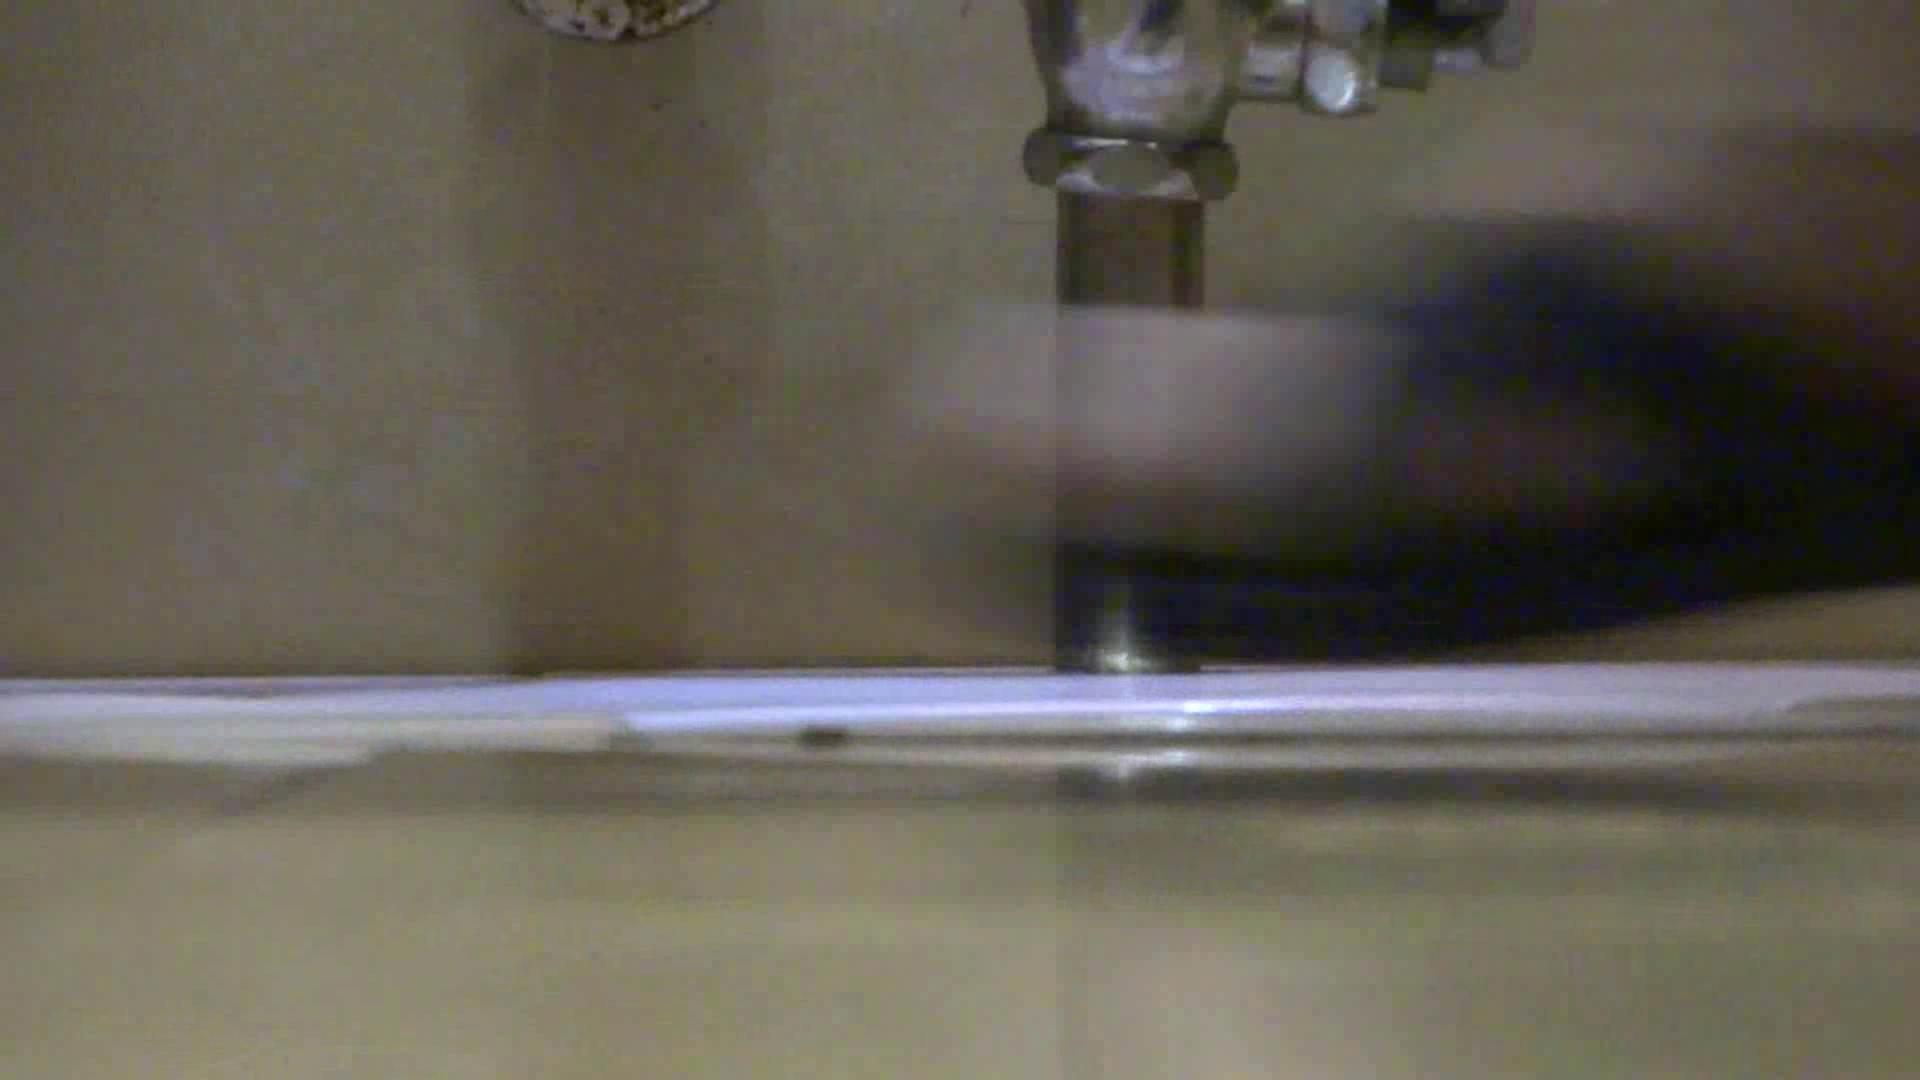 隣国化粧室下から御免!! No.15 洗面所 | 美女H映像  103画像 87